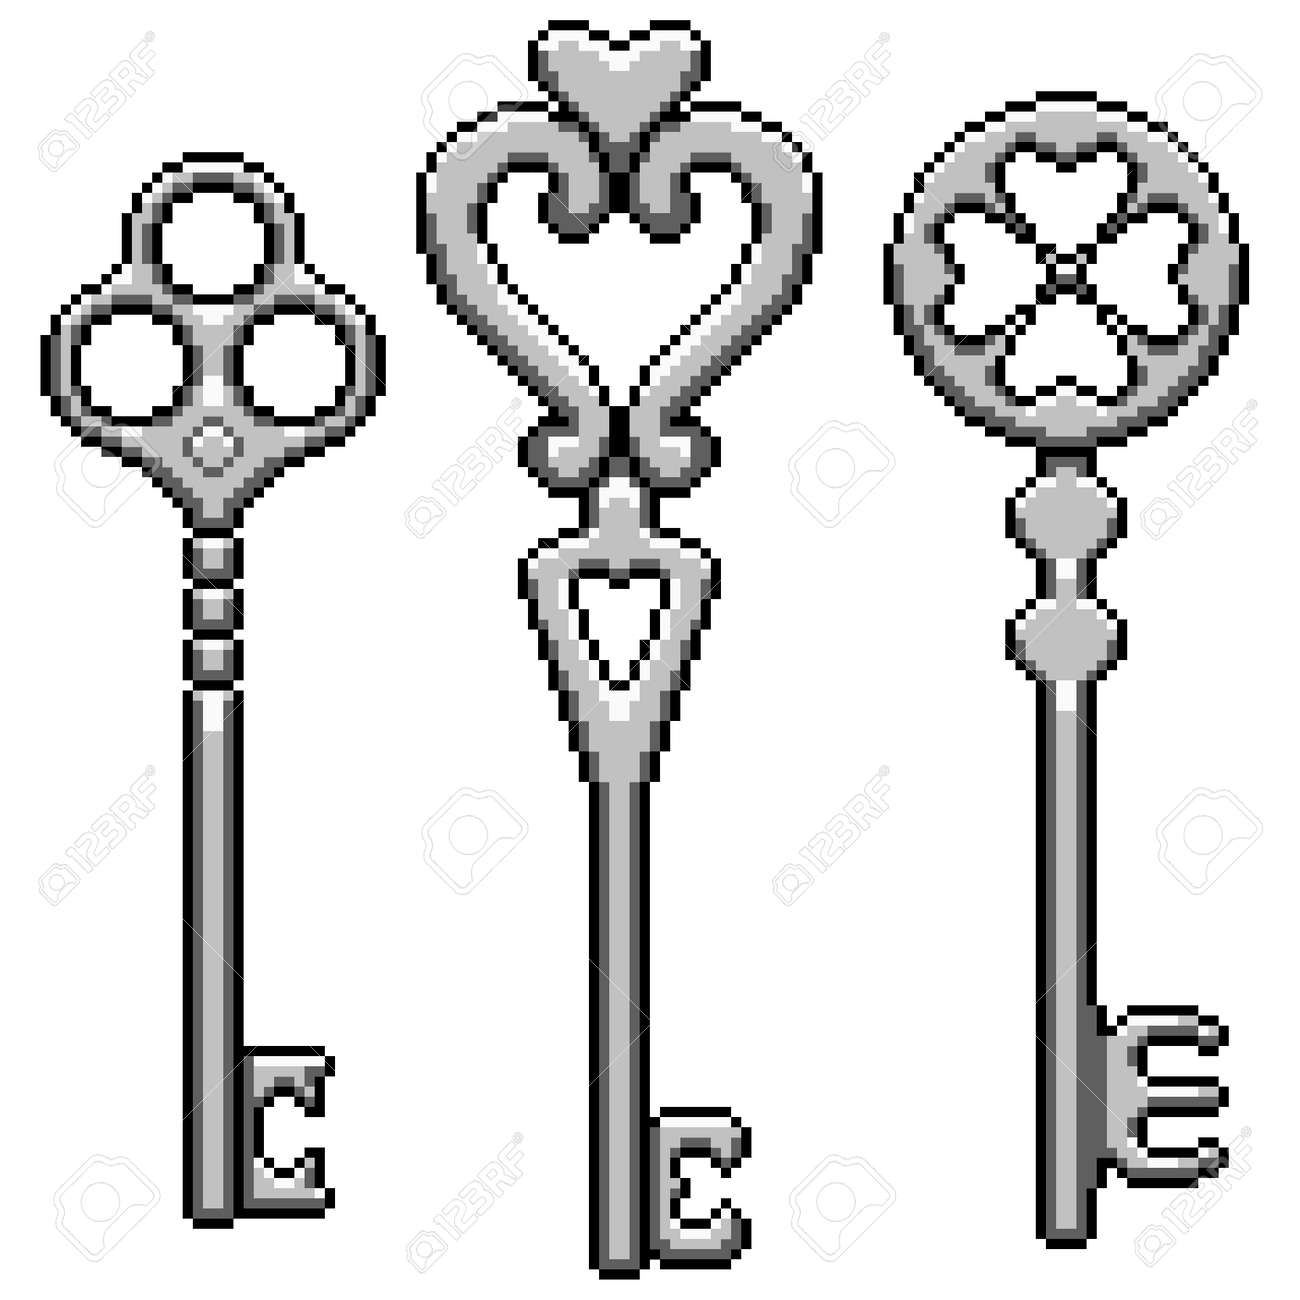 pixel art of fantasy metal key - 169836195